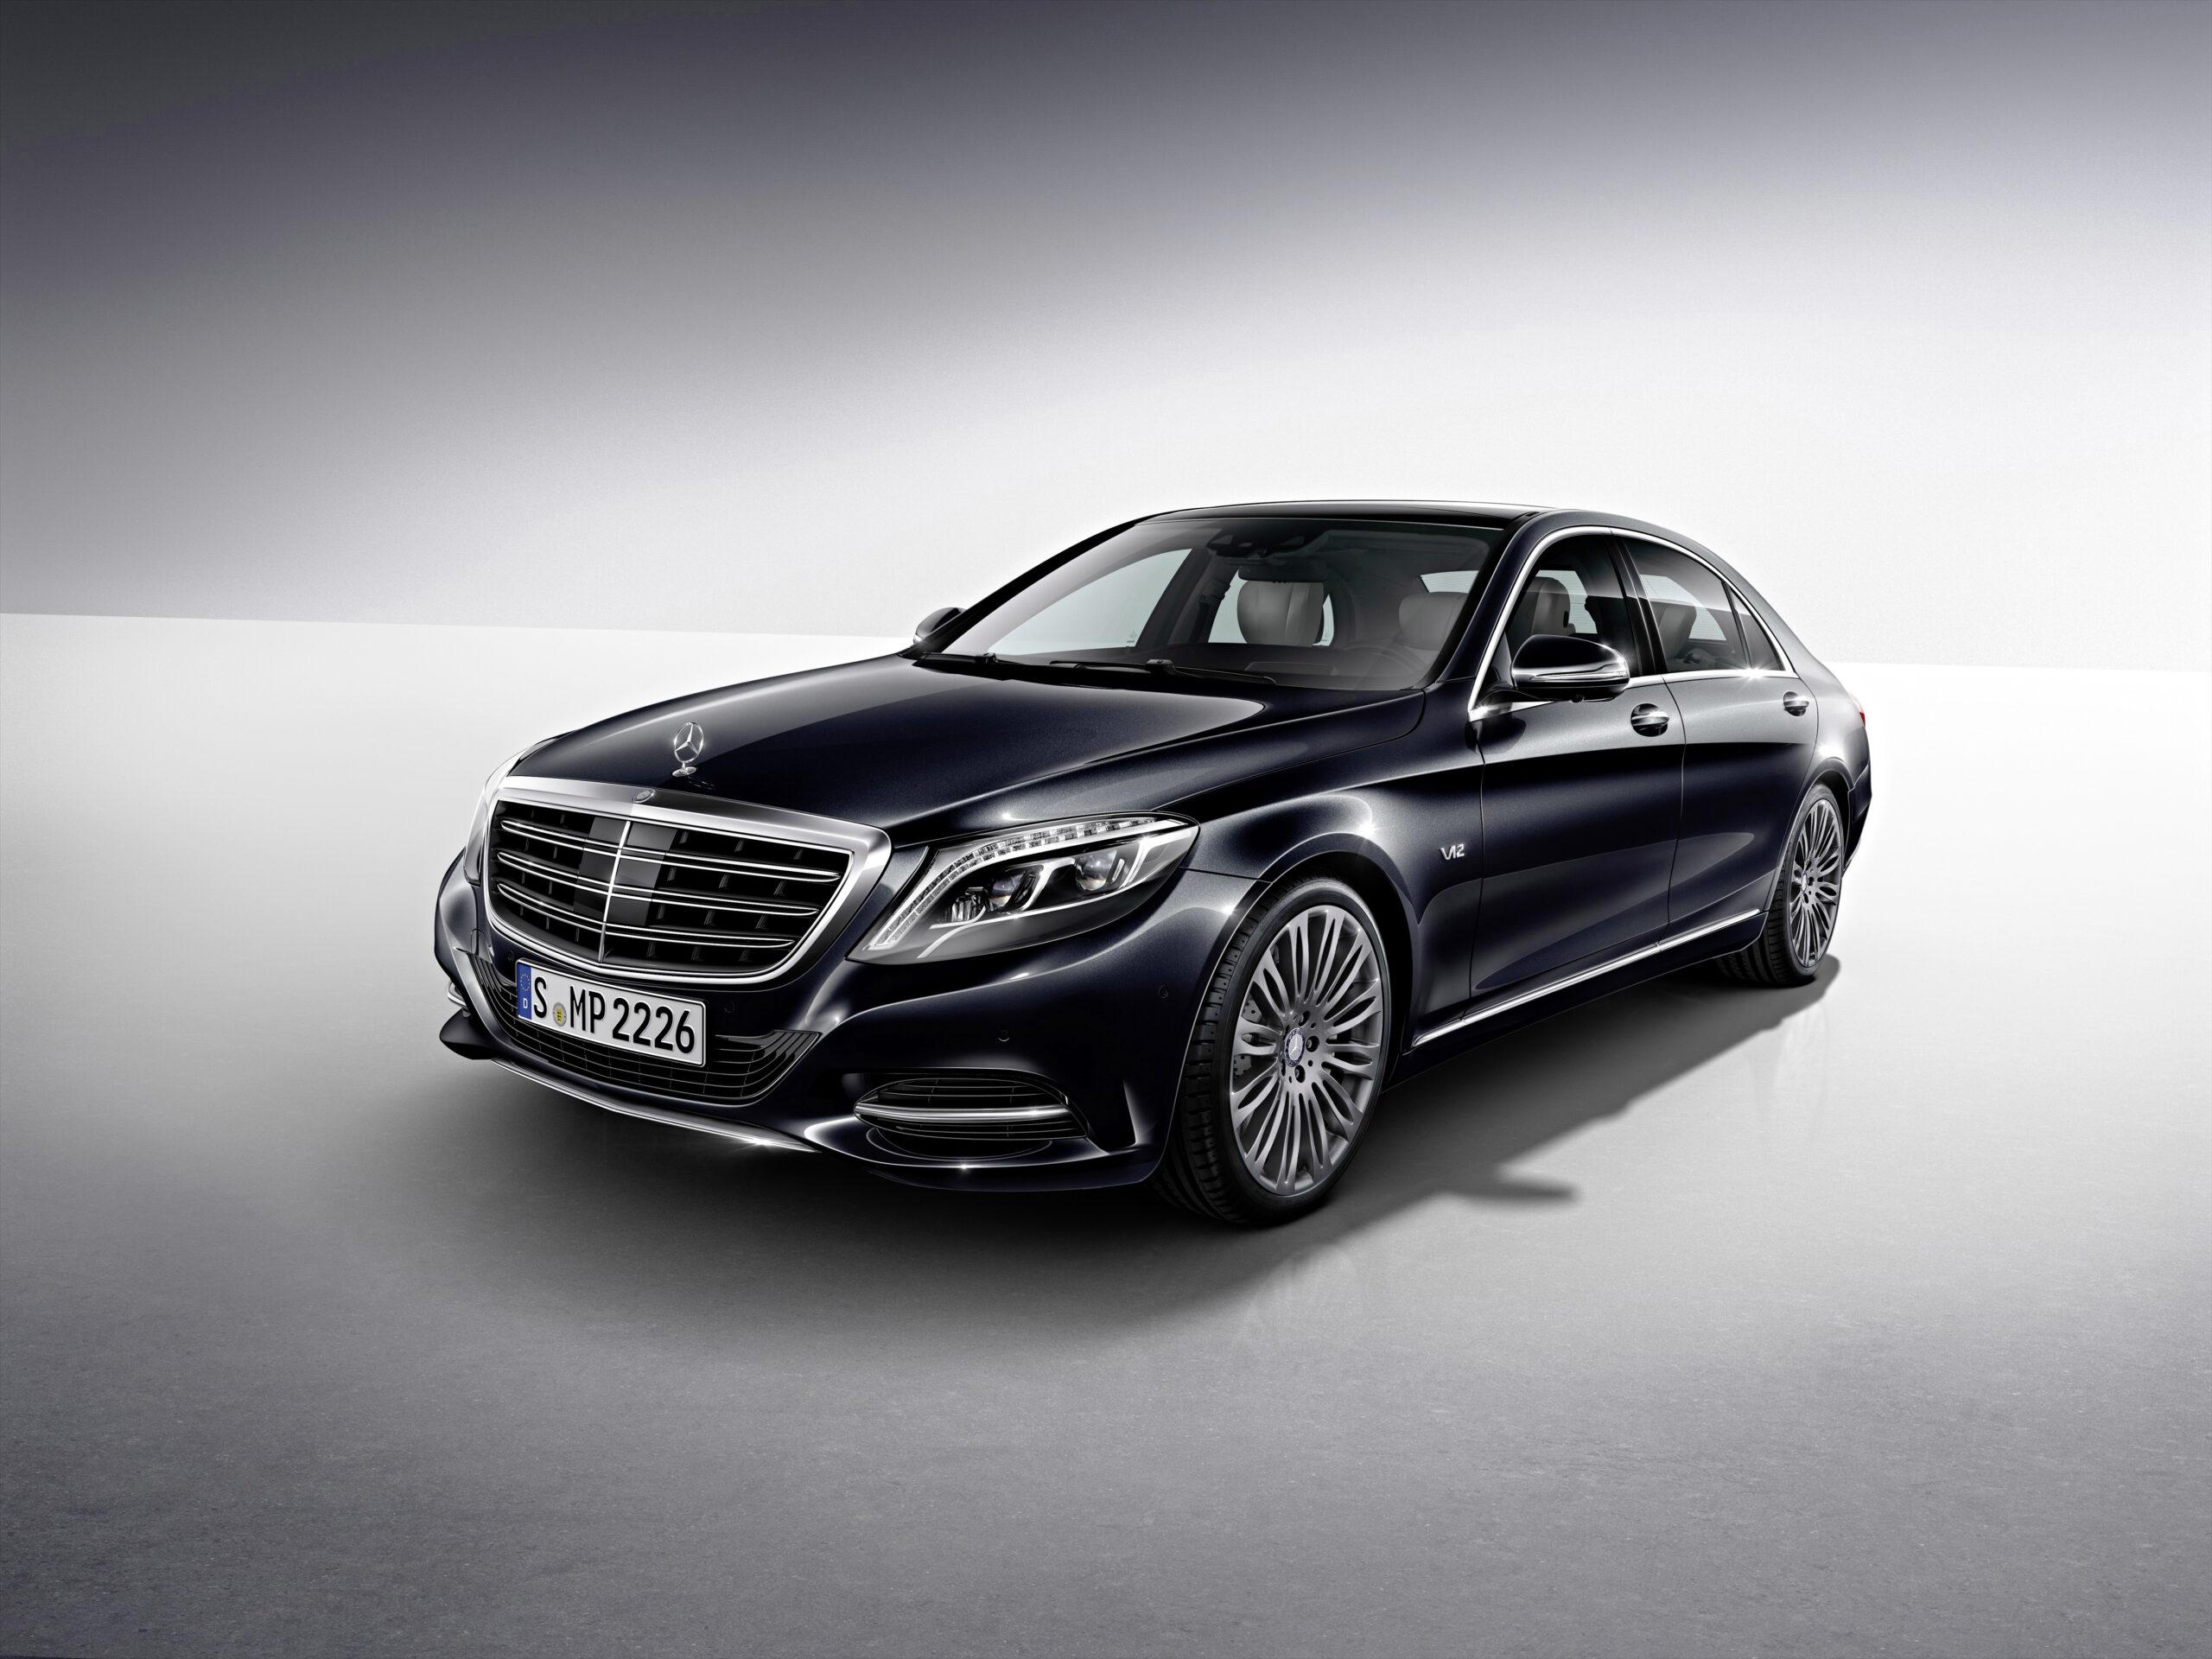 Mercedes-Benz S-Klasse, S 600 (2013)   Mercedes-Benz S-Class, S 600 (2013)